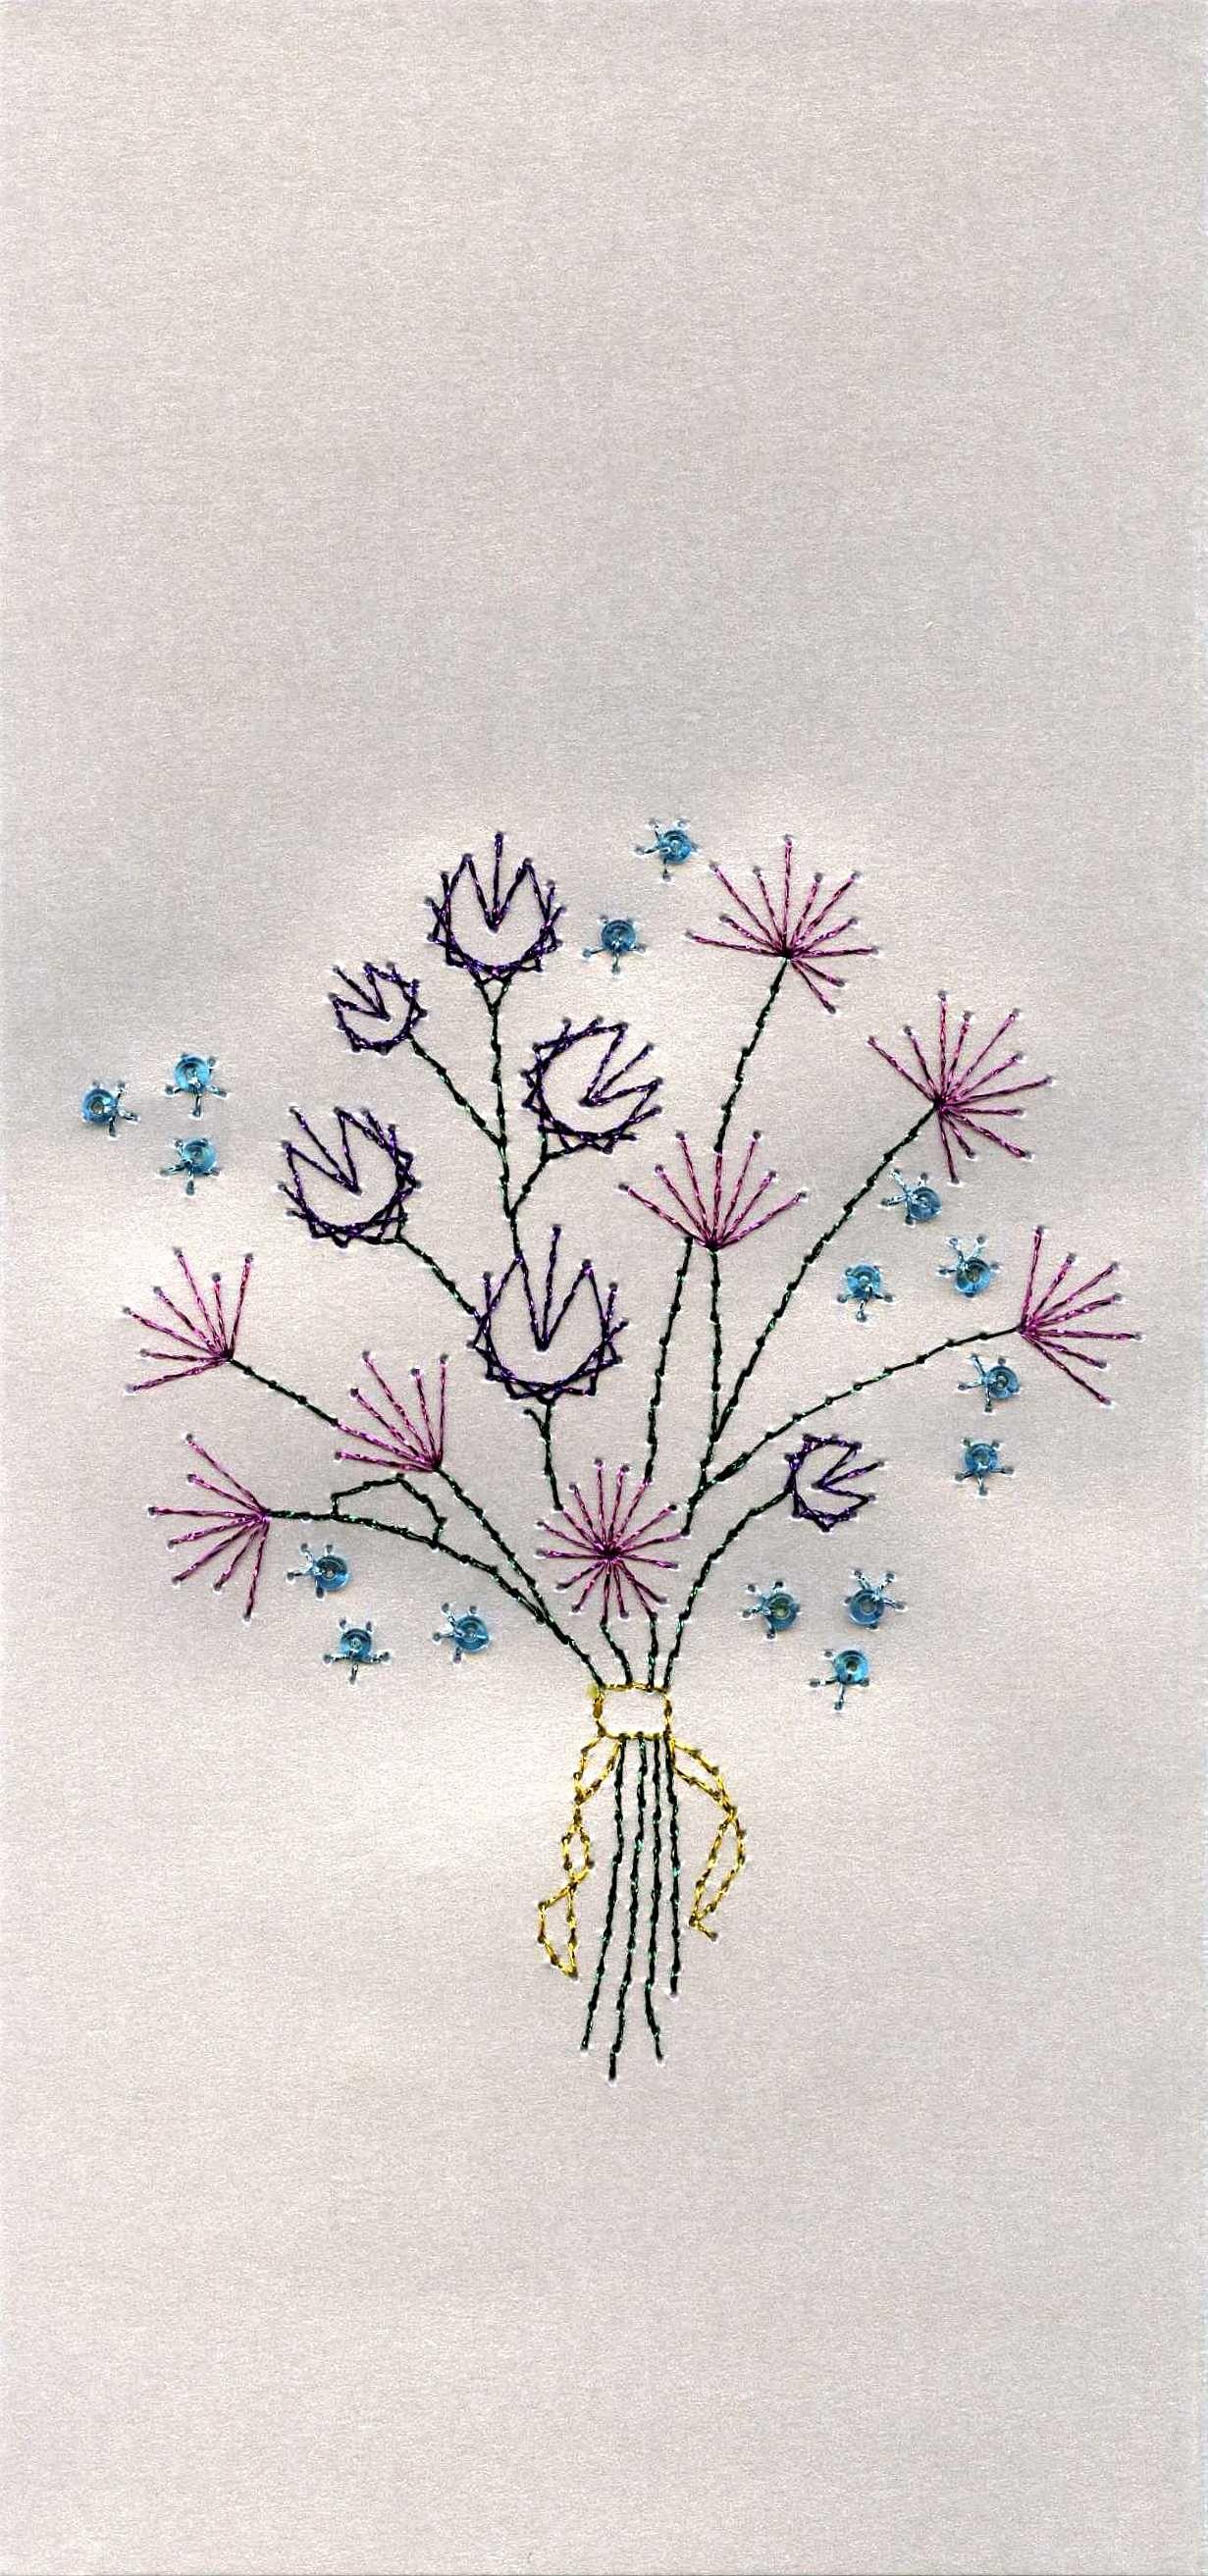 Haft Matematyczny Fadengrafik Fadengrafik Blumen Grafik